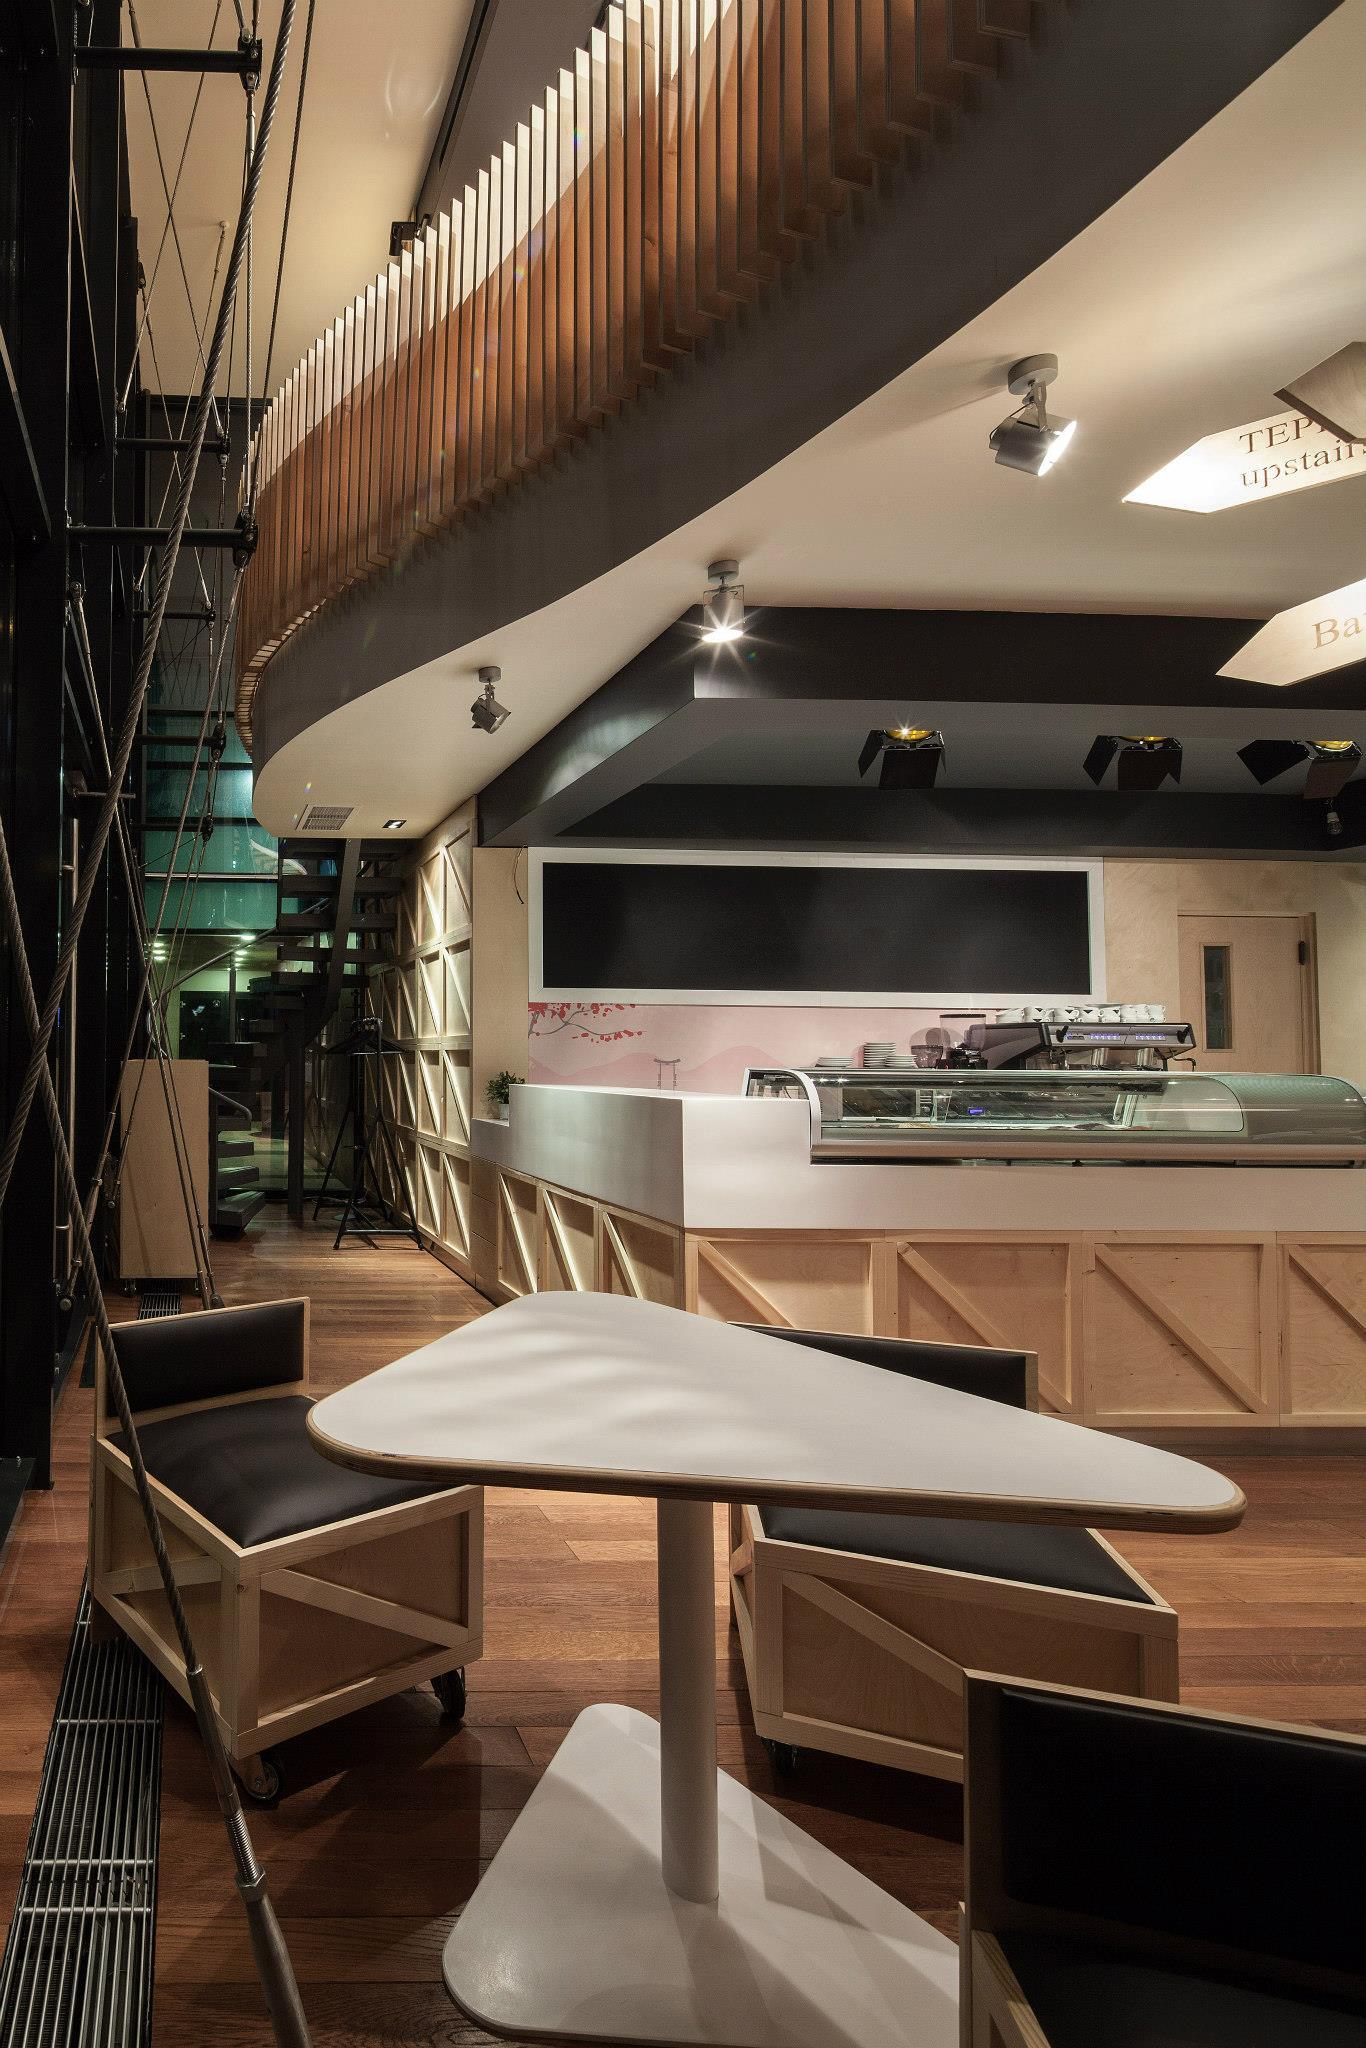 YOSHI-Sushi-Teppanyaki-Trivenus-Ama-Design-17